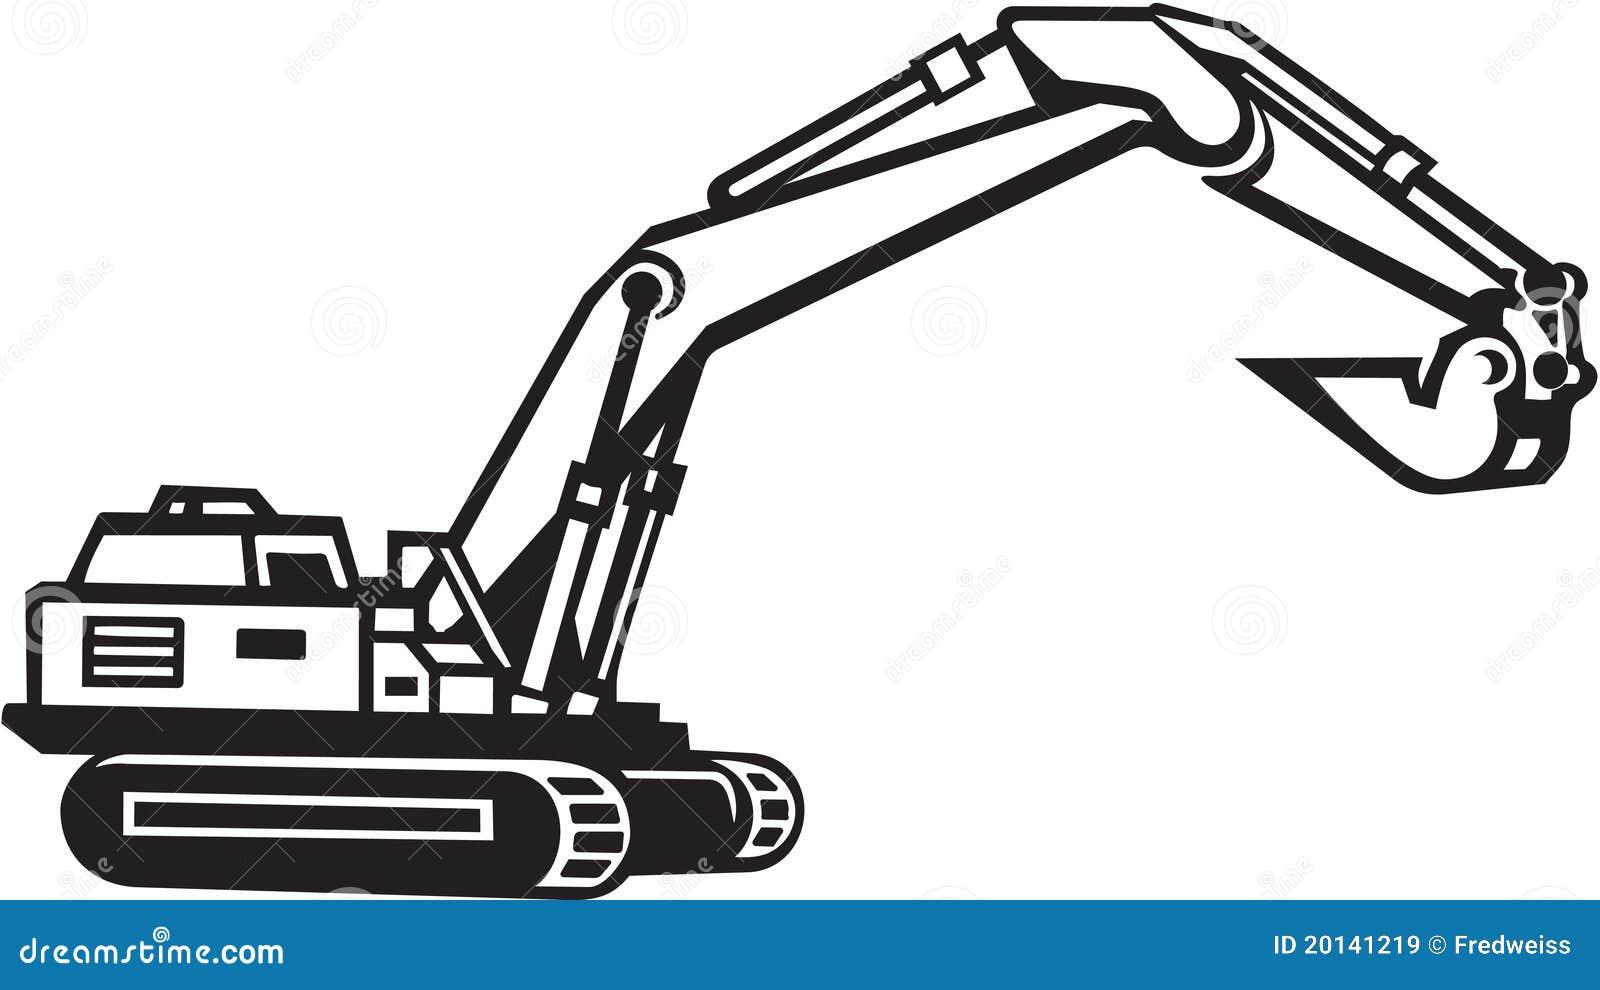 Excavator Illustration Stock Vector Of